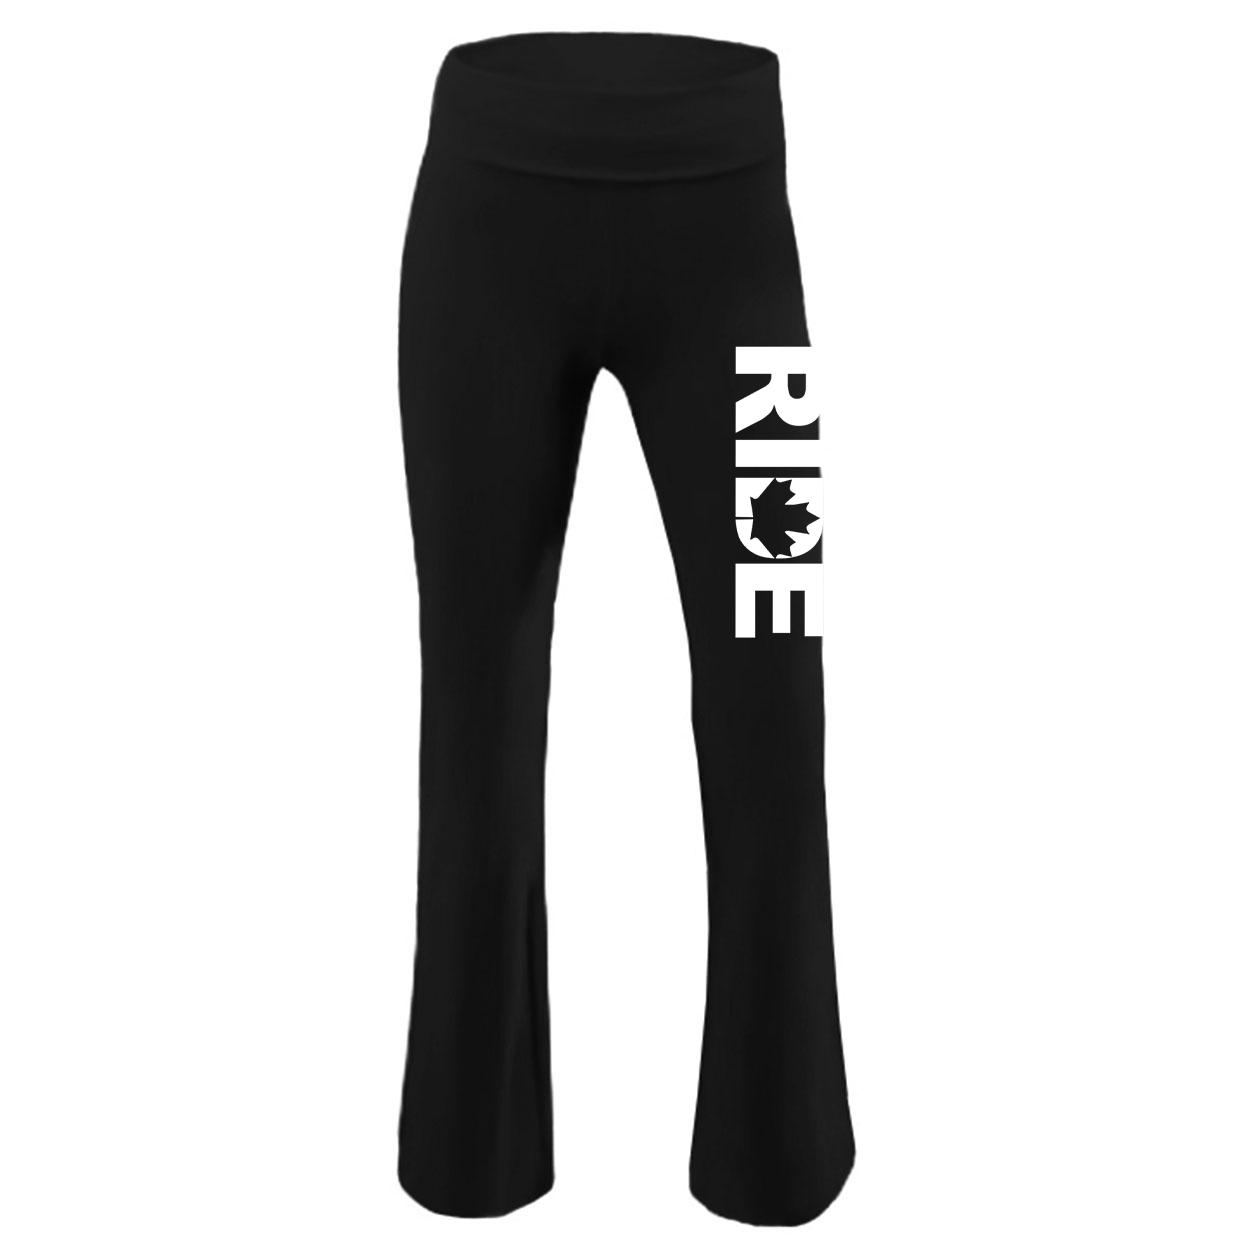 Ride Canada Classic Youth Girls Yoga Pants Black (White Logo)